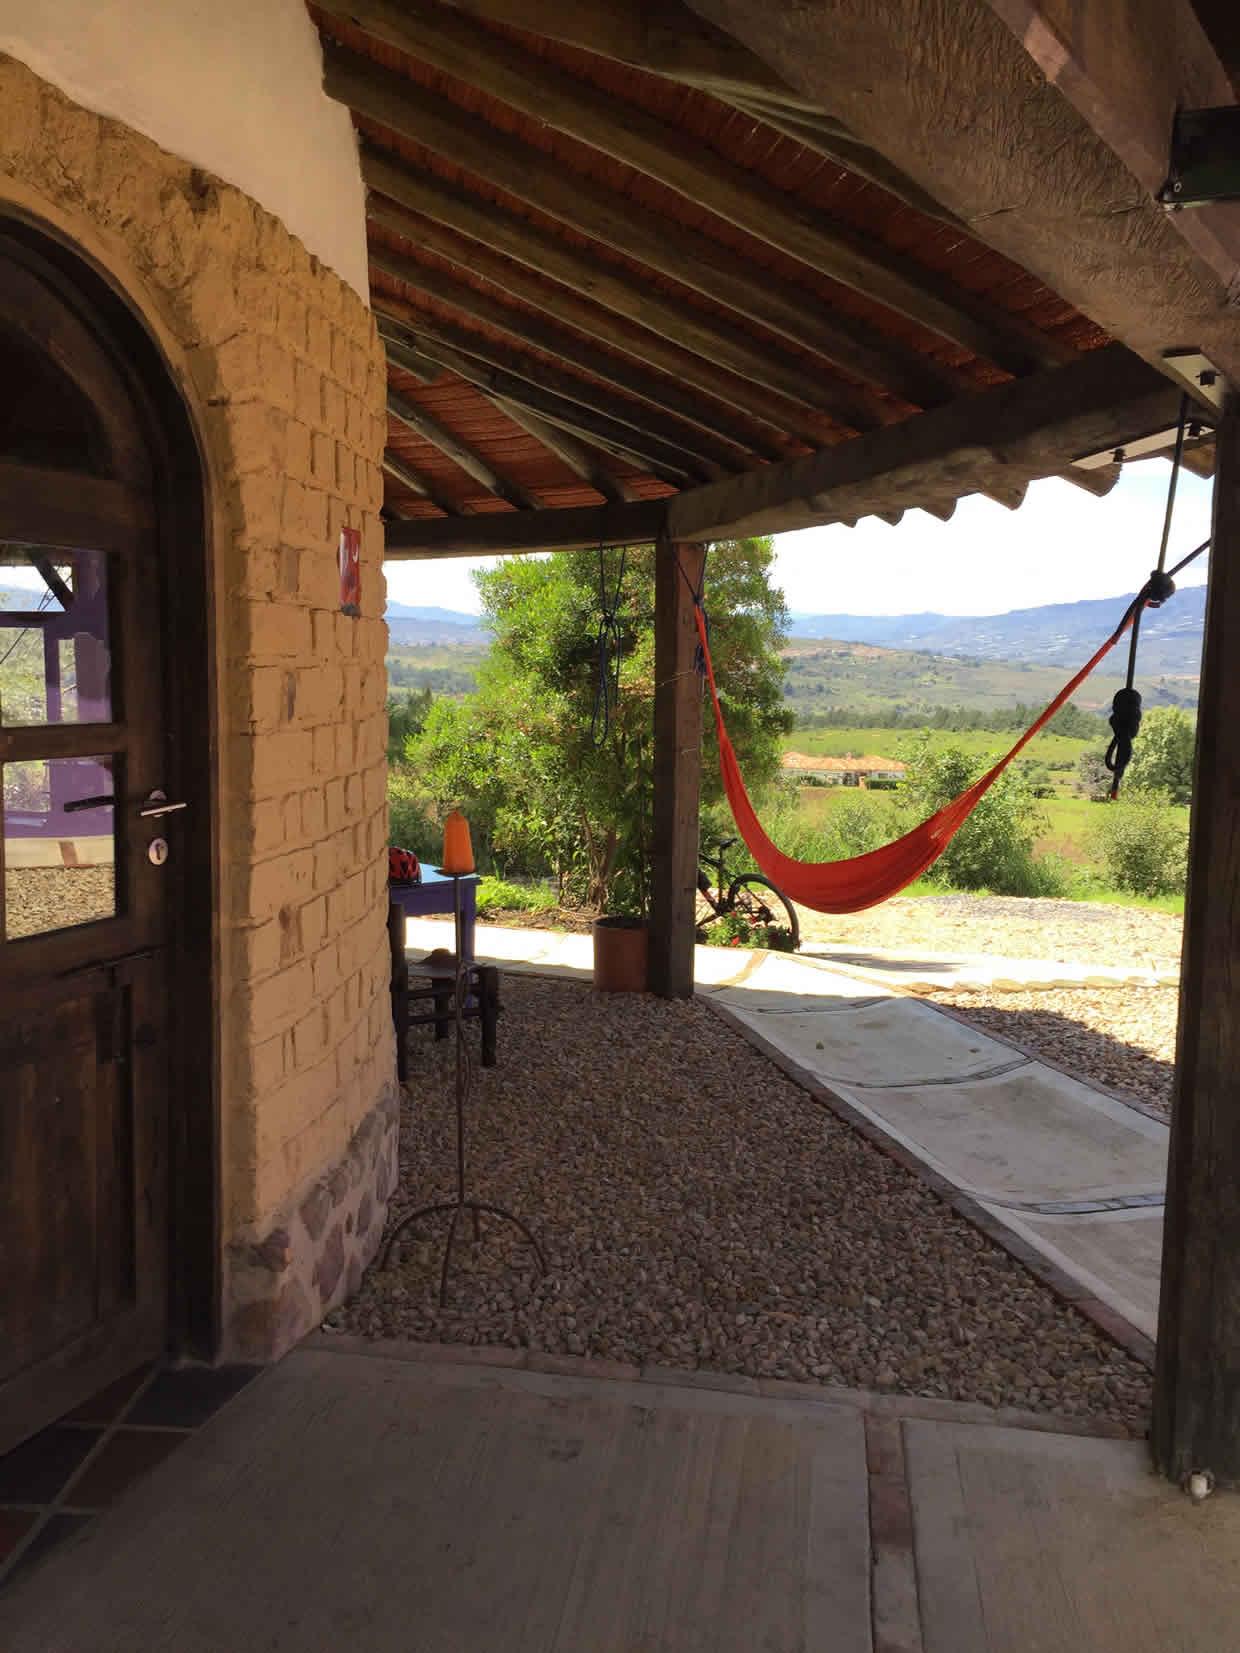 Alquiler casa Jishana Villa de Leyva - Hamacas